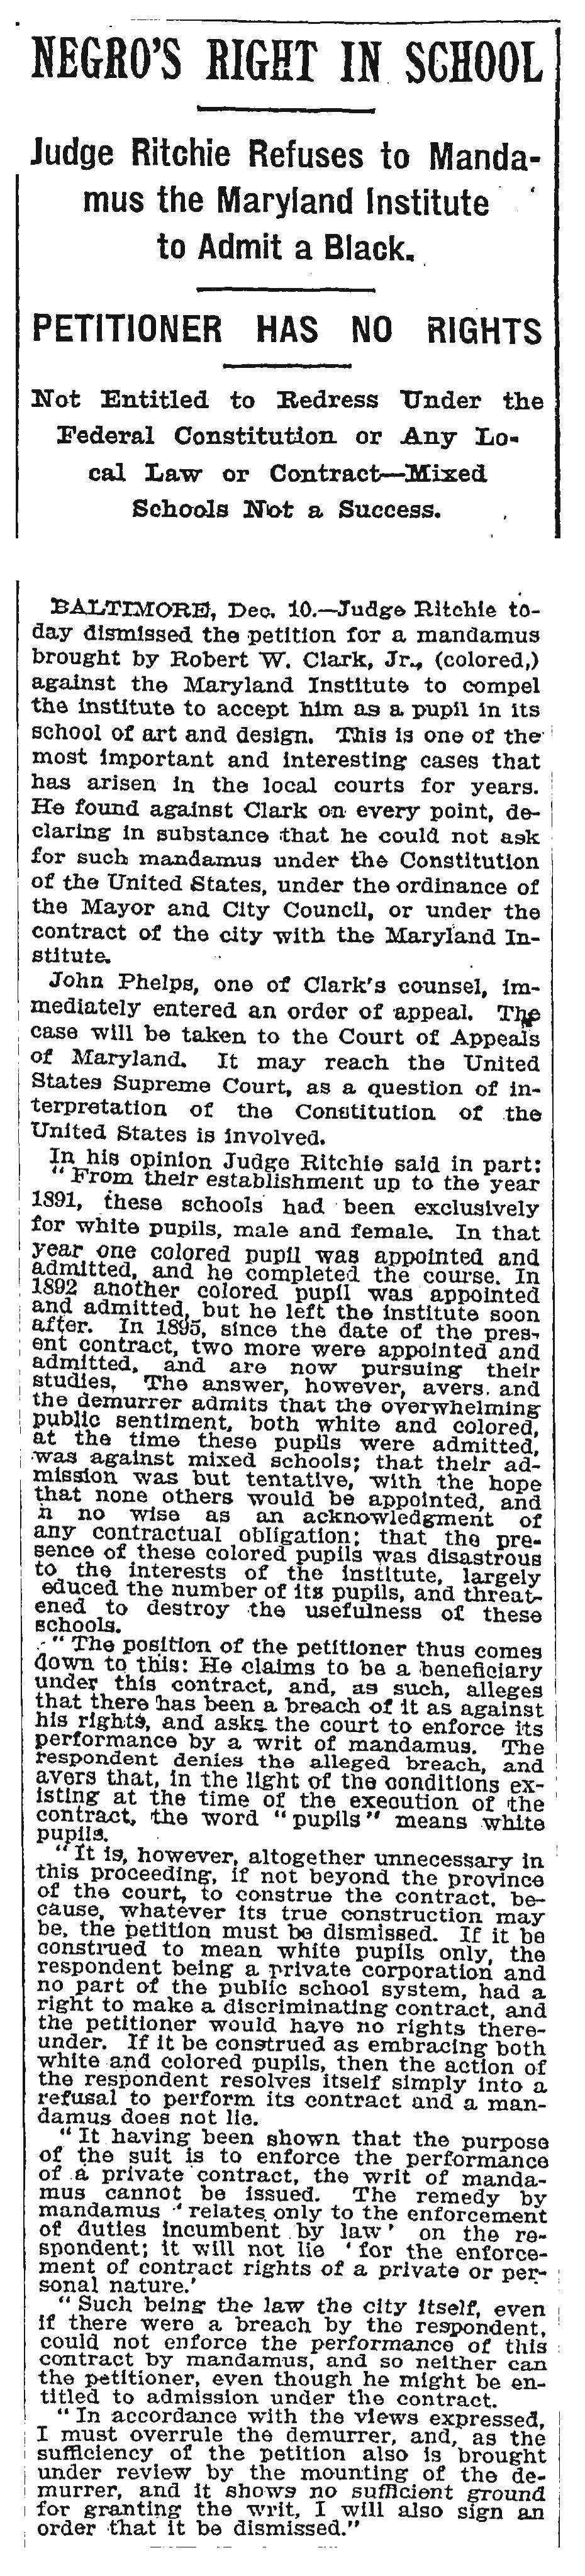 1897-12-11-NEGRO'S_RIGHT_IN_SCHOOL_JUDGE.jpg